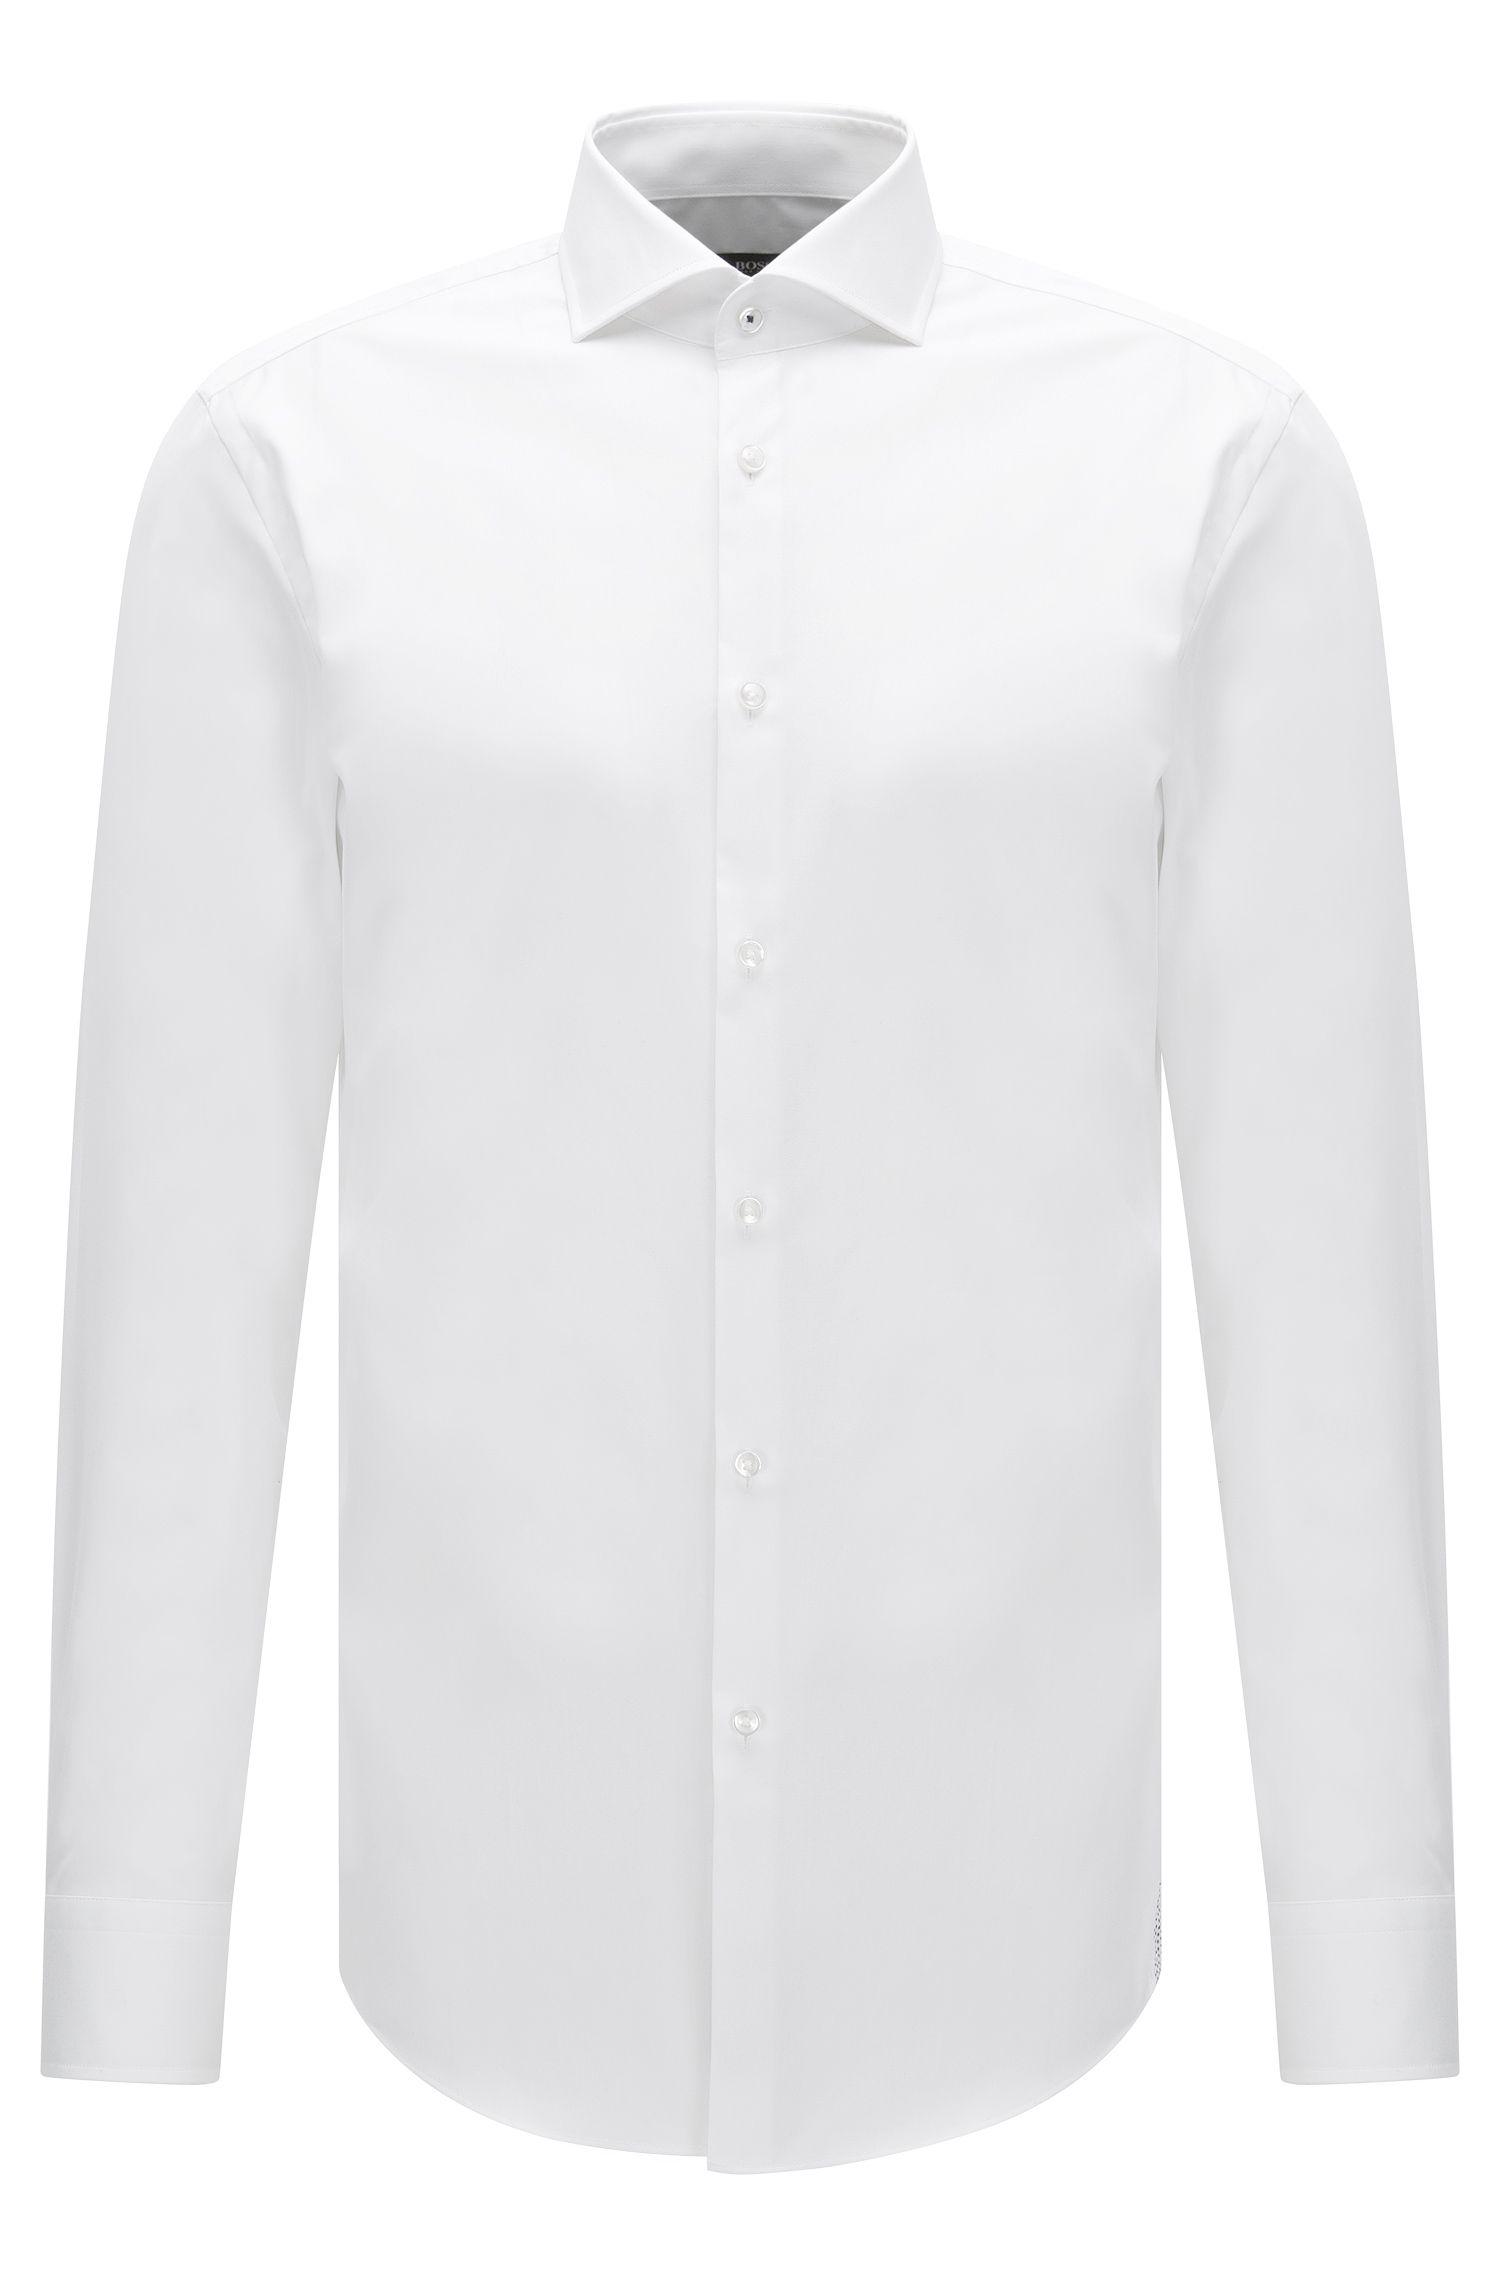 Easy Iron Italian Cotton Dress Shirt, Slim Fit  | Jerrin